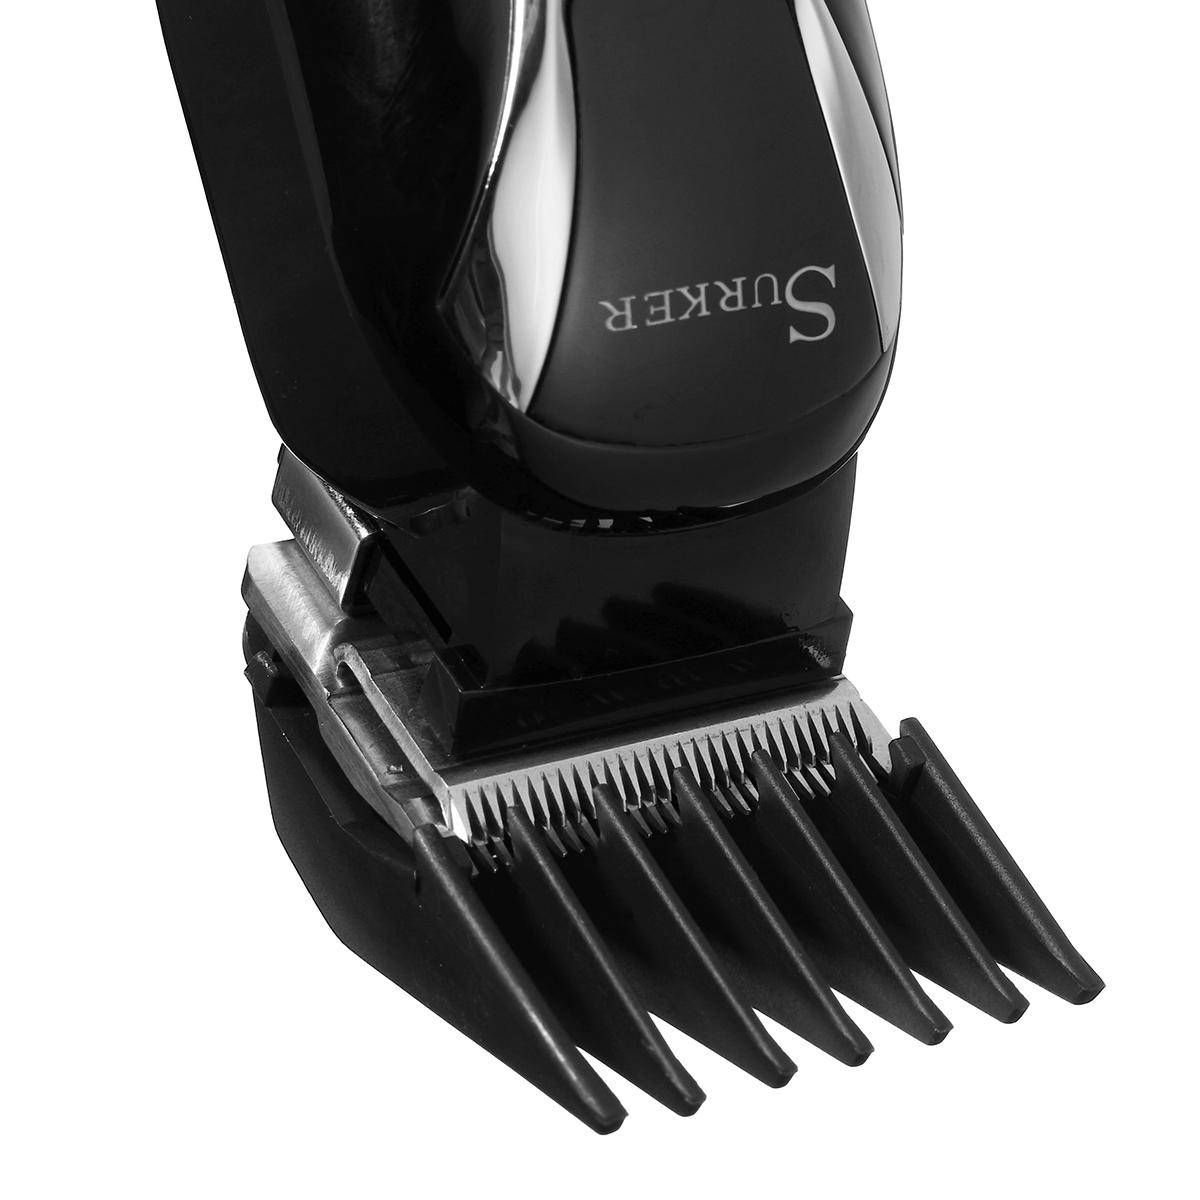 SURKER Barber Salon Electric Hair Clipper Rechargeable LED